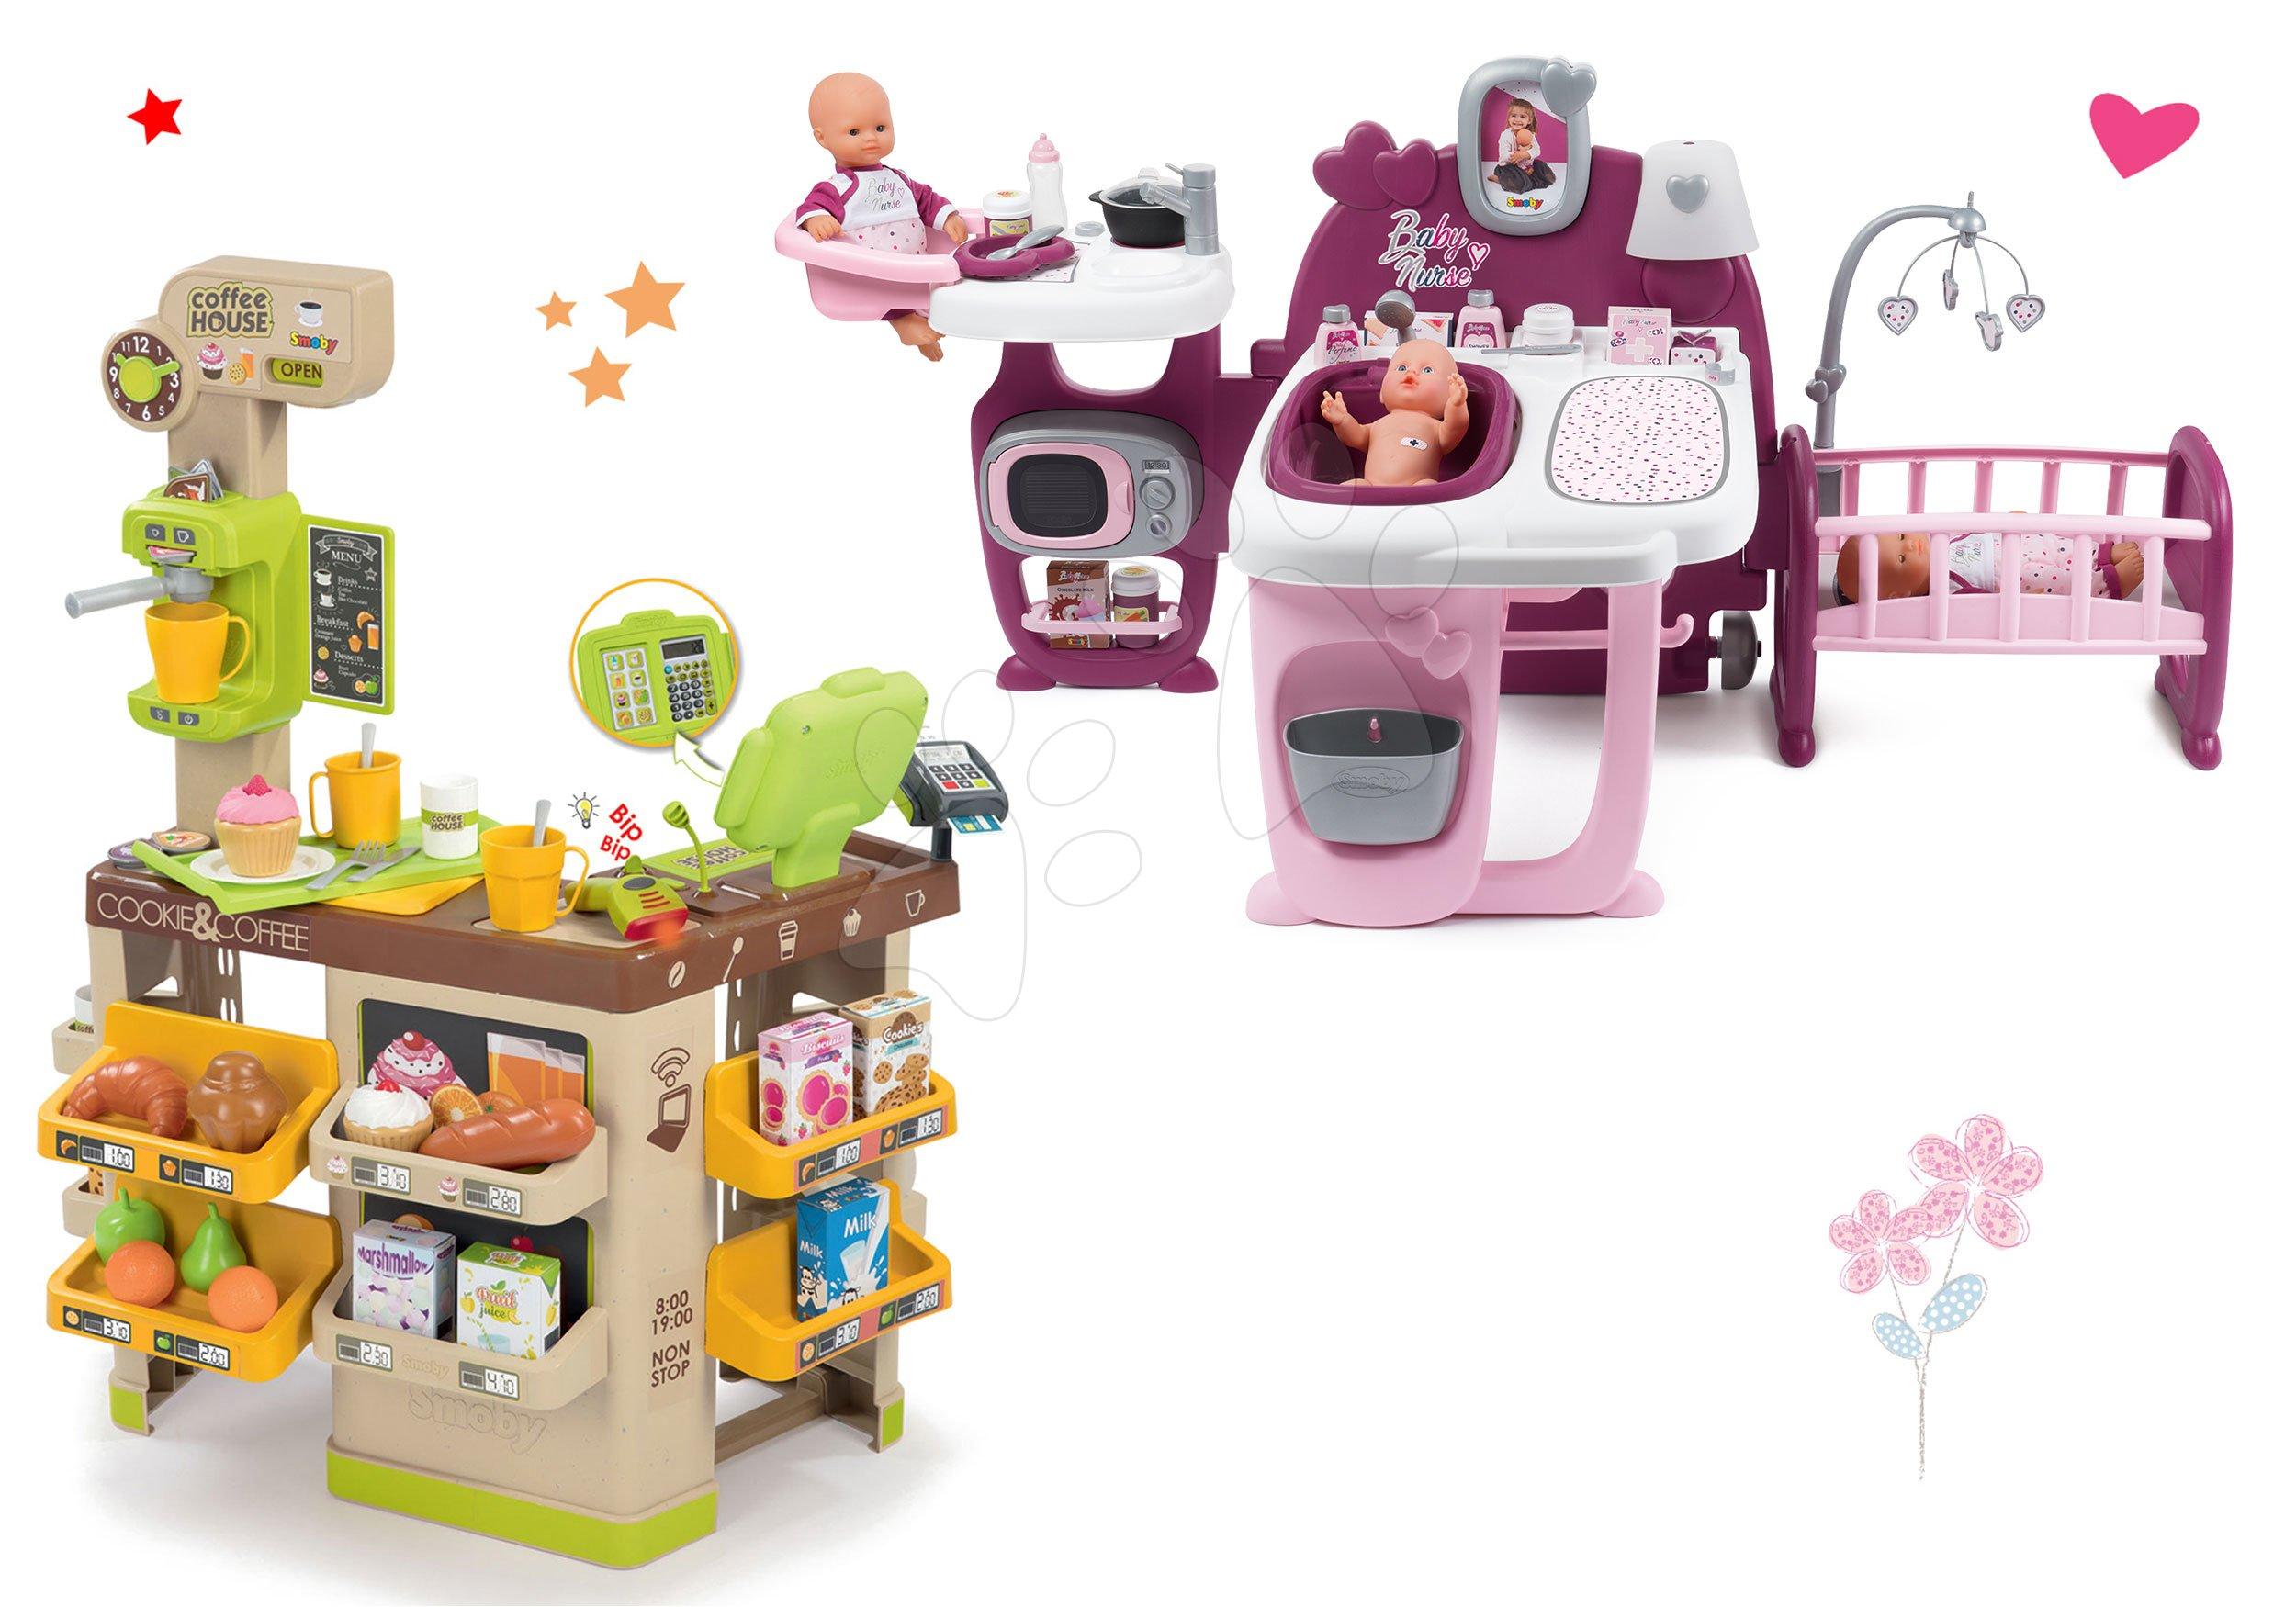 Smoby set domeček pro panenku Baby Nurse Doll´s Play Center a kavárna s kávovarem Coffee House 220327-10